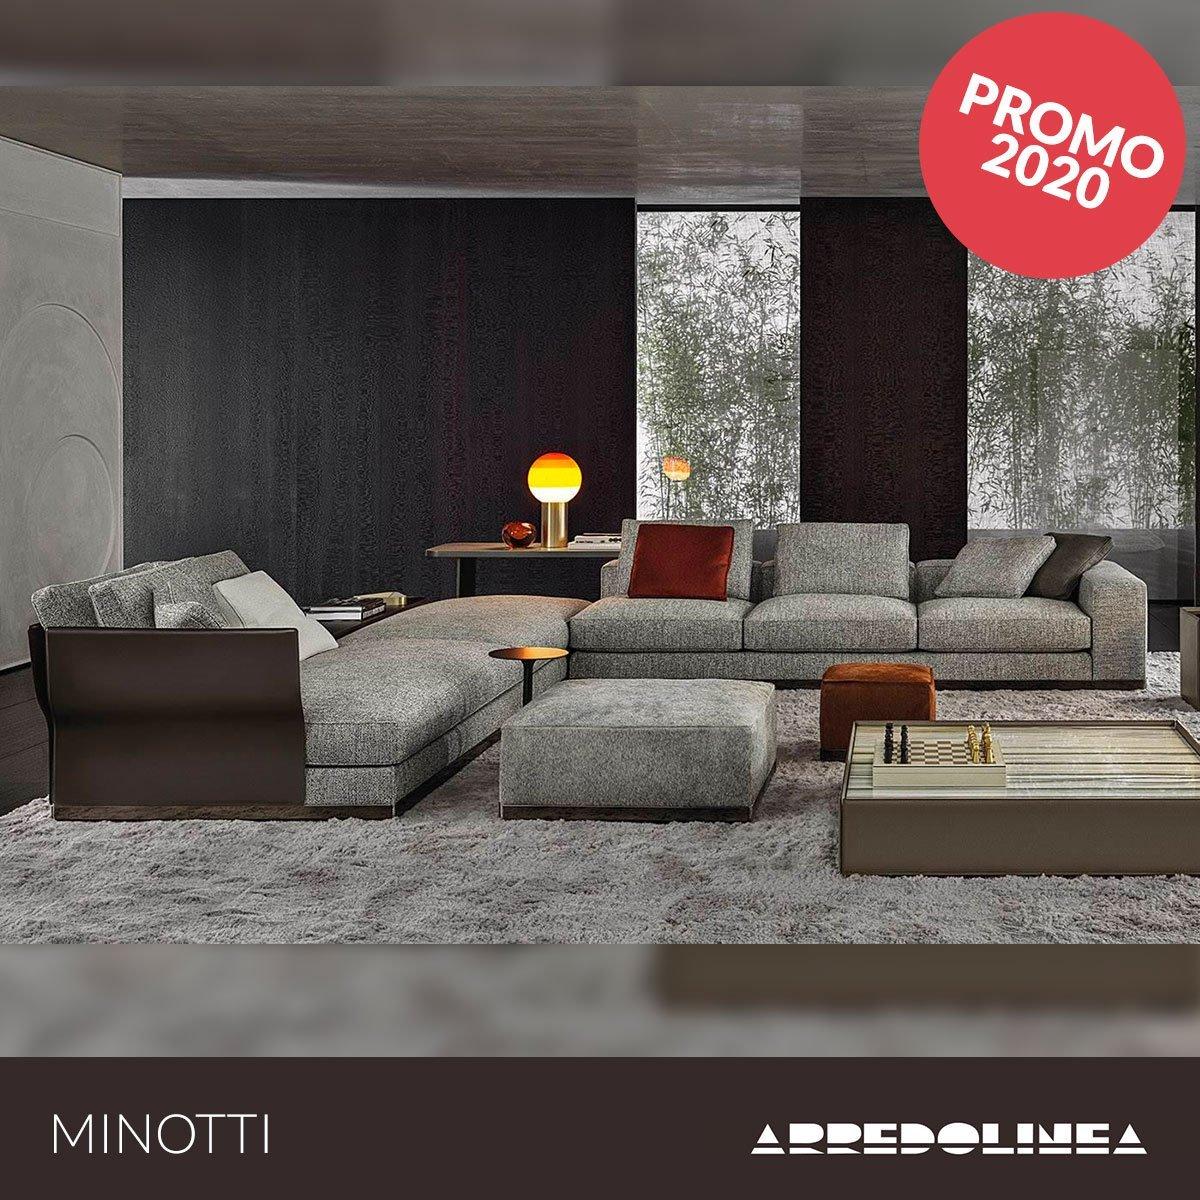 Promo 2020 - Minotti